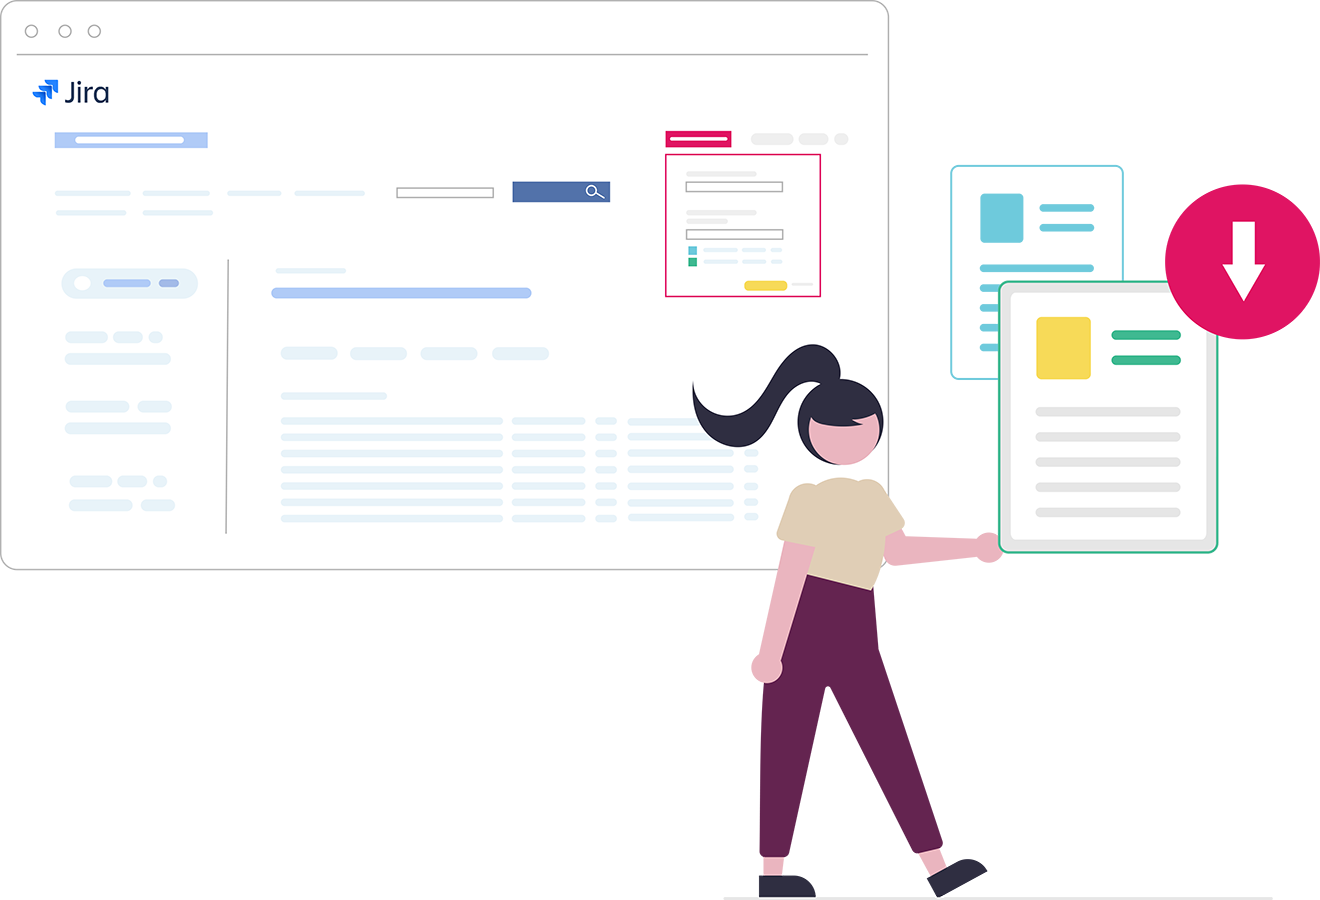 jira-jql-exporter les résultats de recherche-smartview